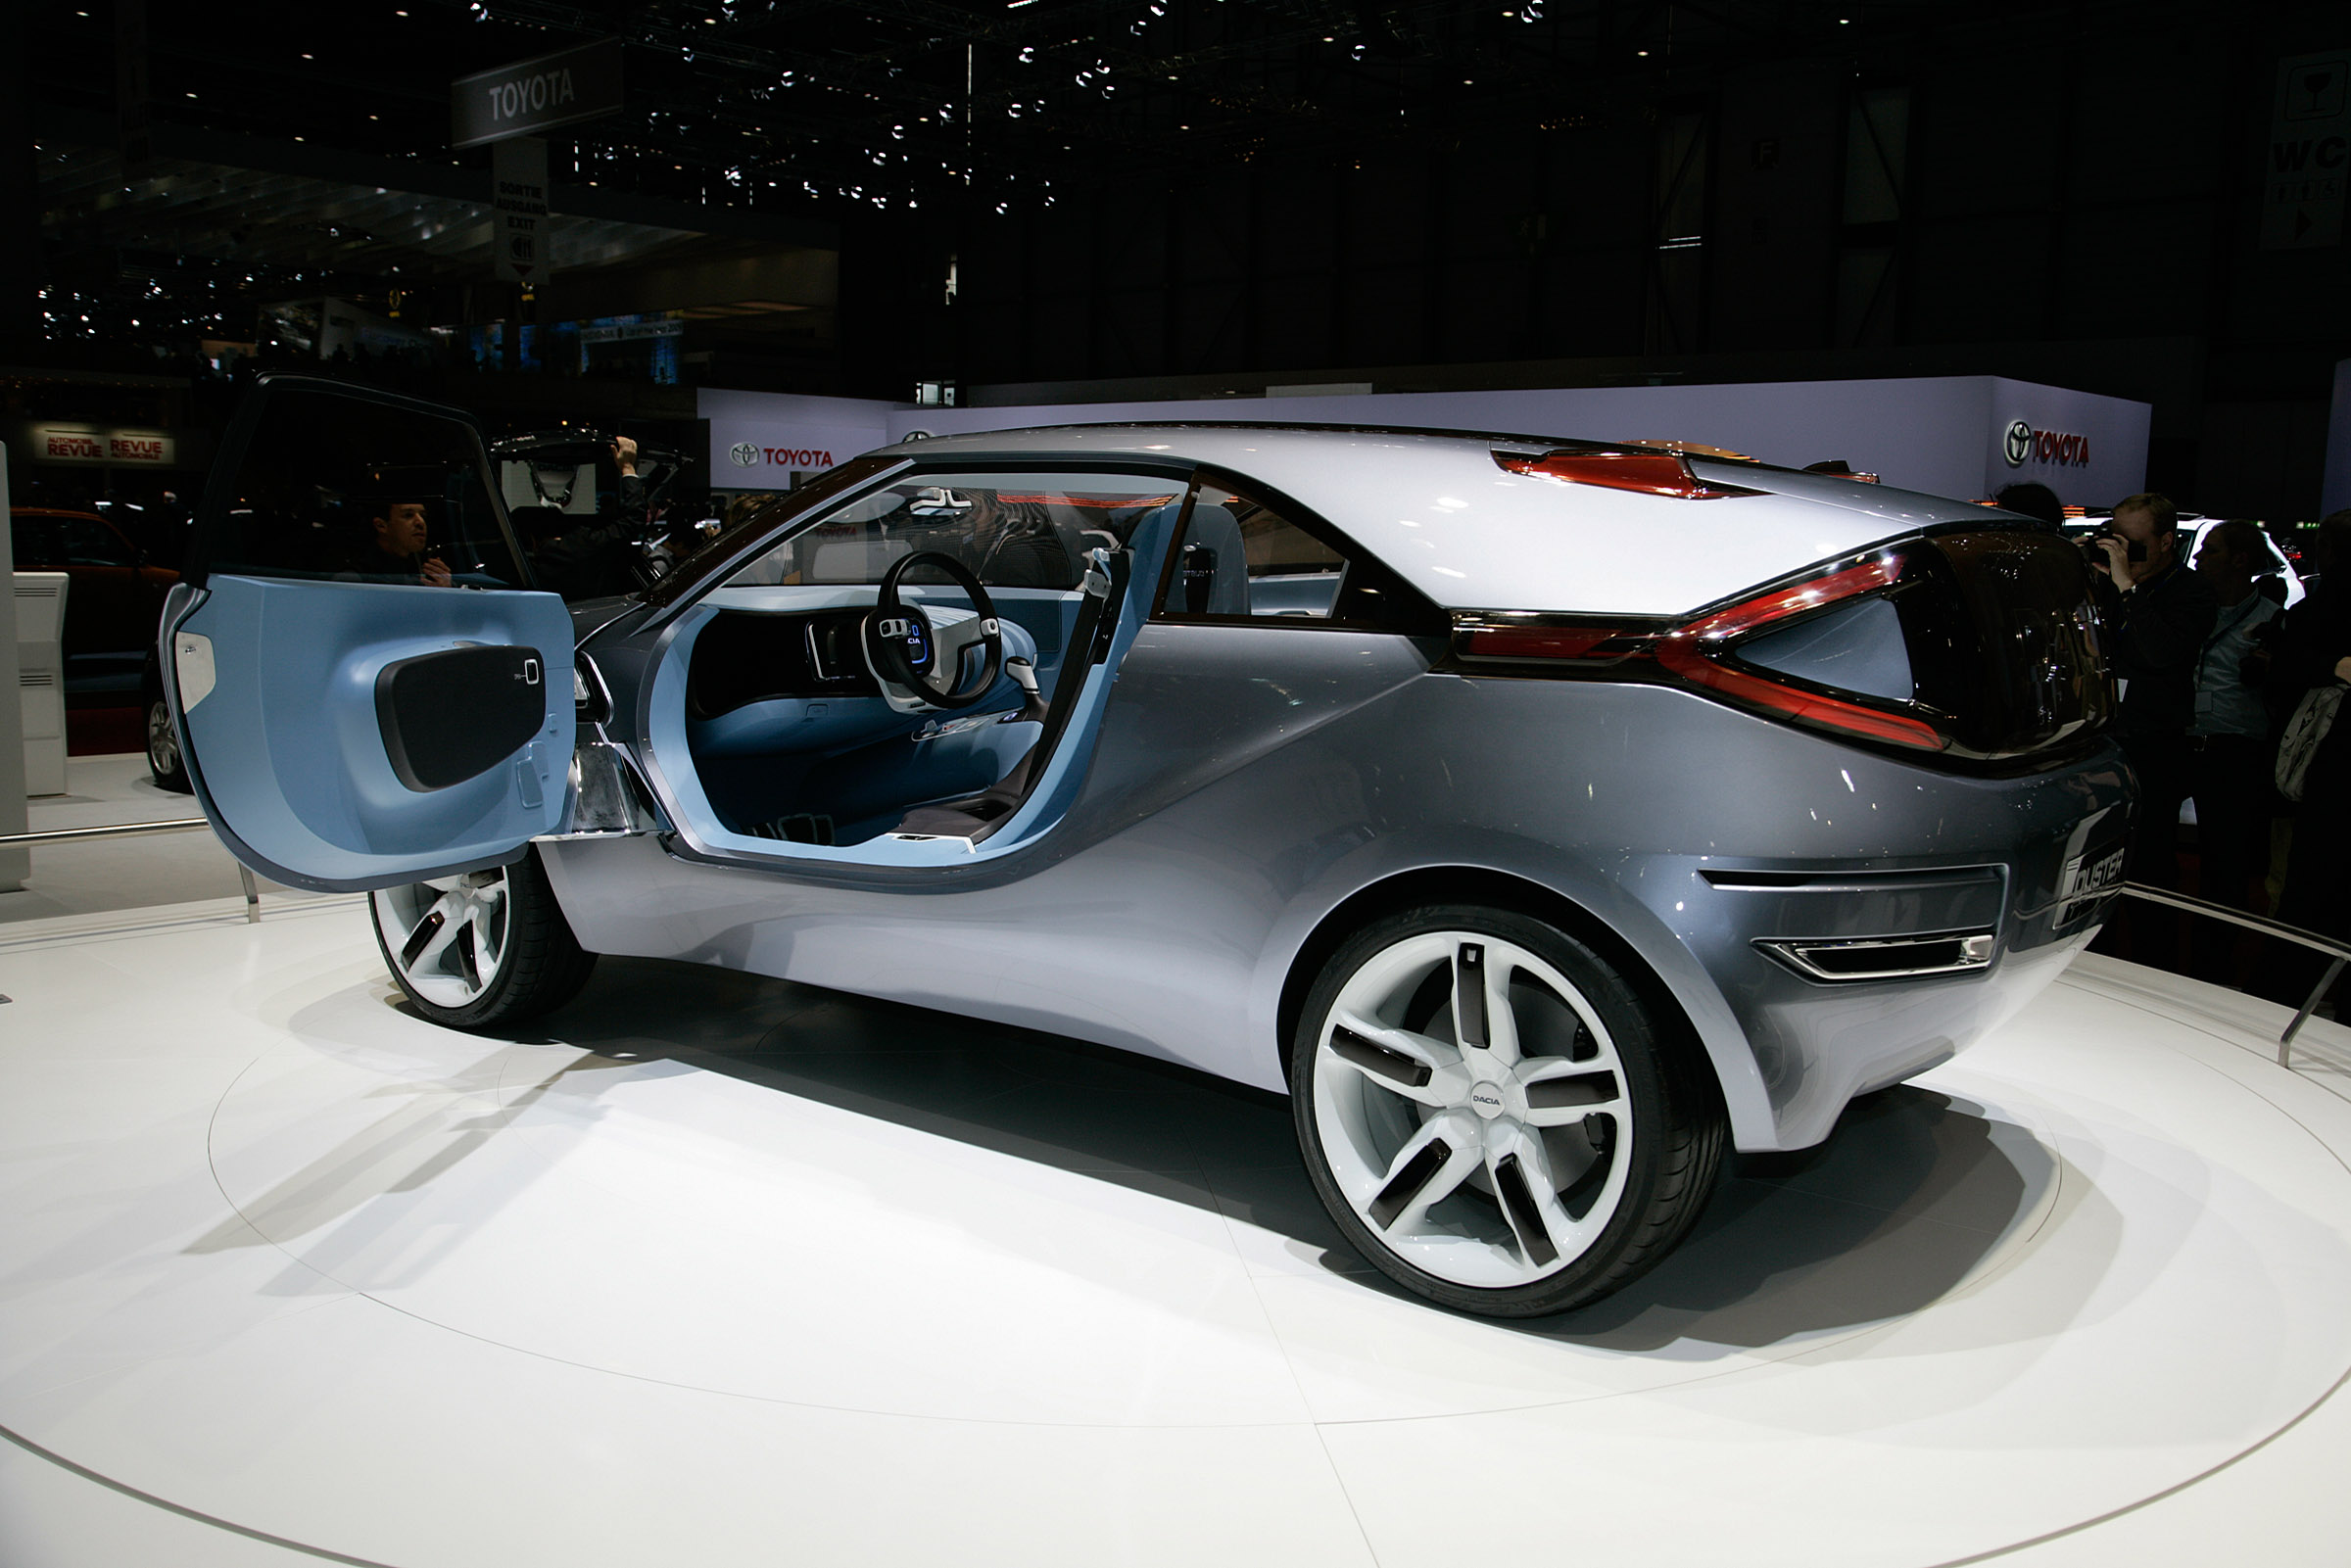 dacia duster crossover concept unveiled at geneva motor show. Black Bedroom Furniture Sets. Home Design Ideas